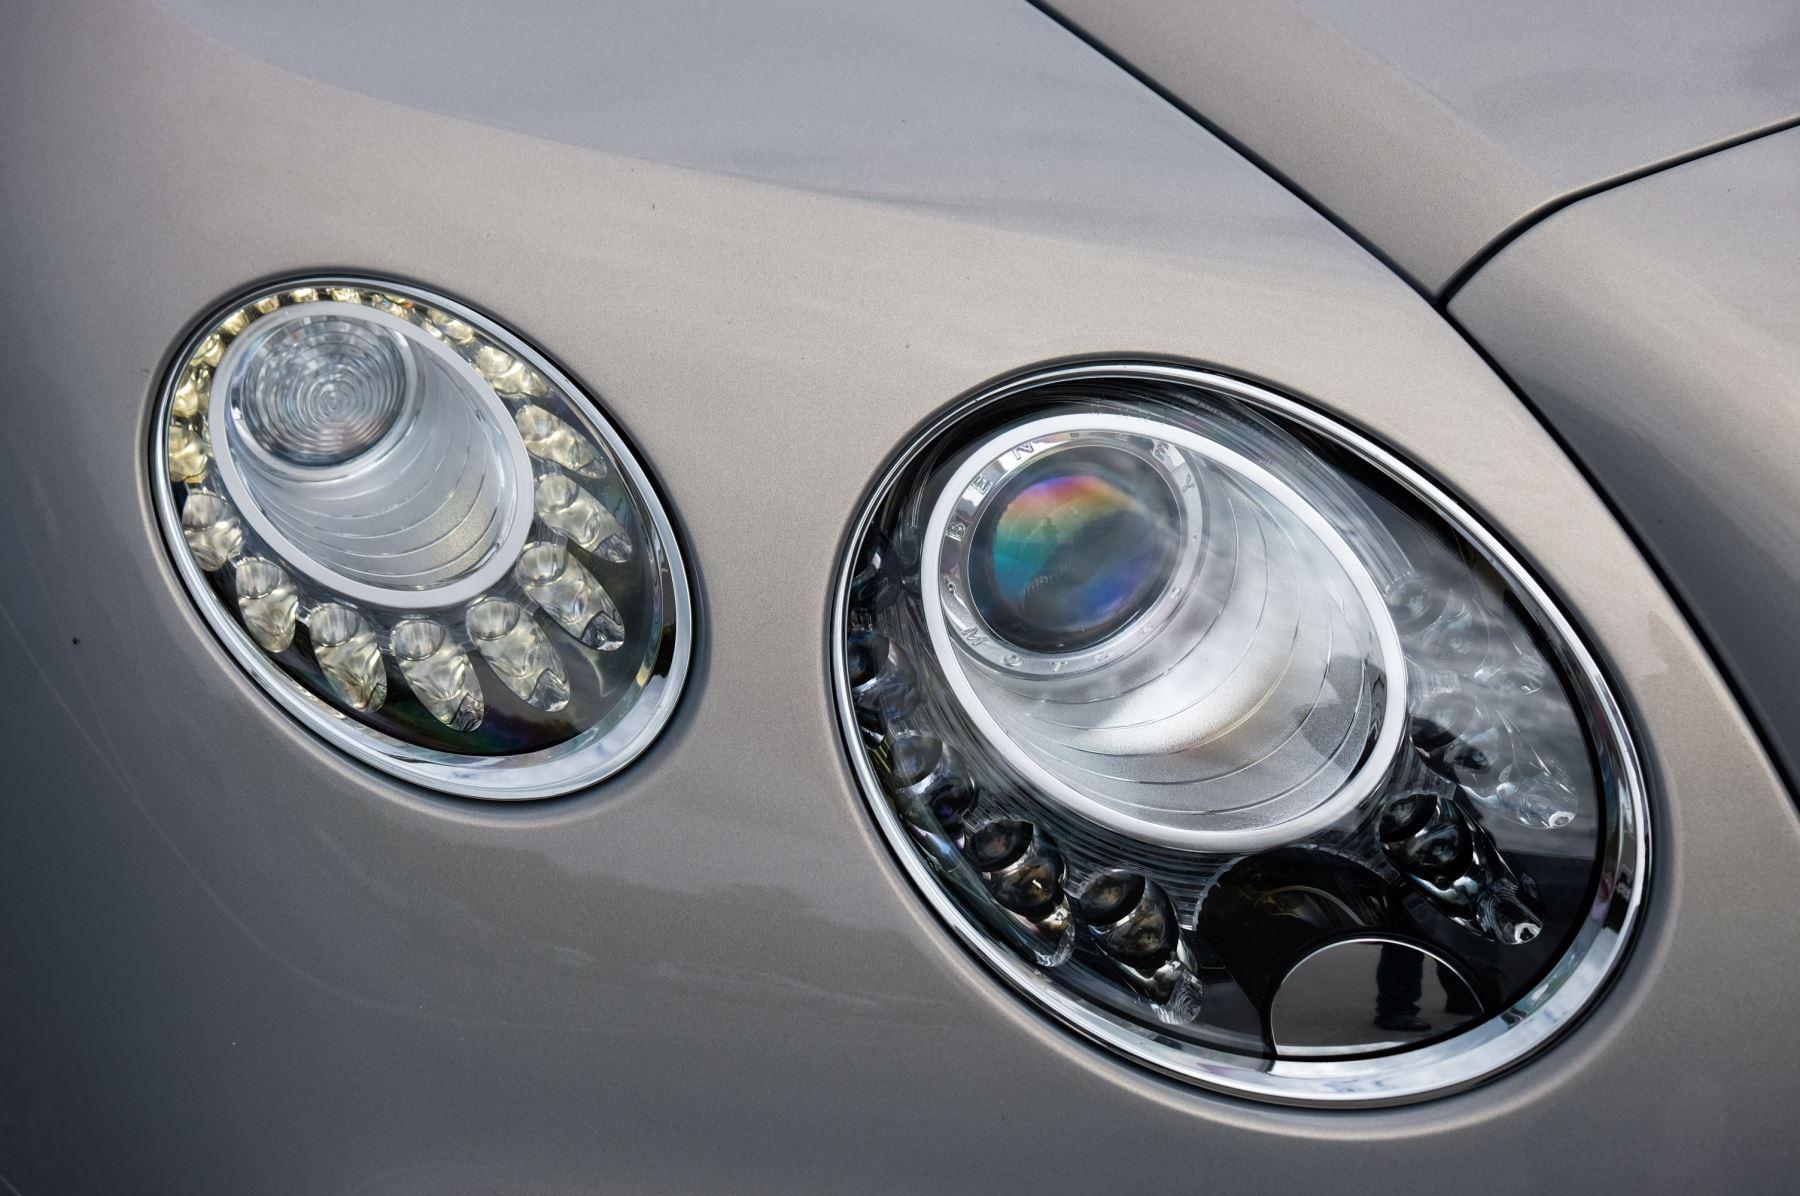 Bentley Continental GT 6.0 W12 [635] Speed - Premier Specification - Carbon Fibre Fascia Panels image 9